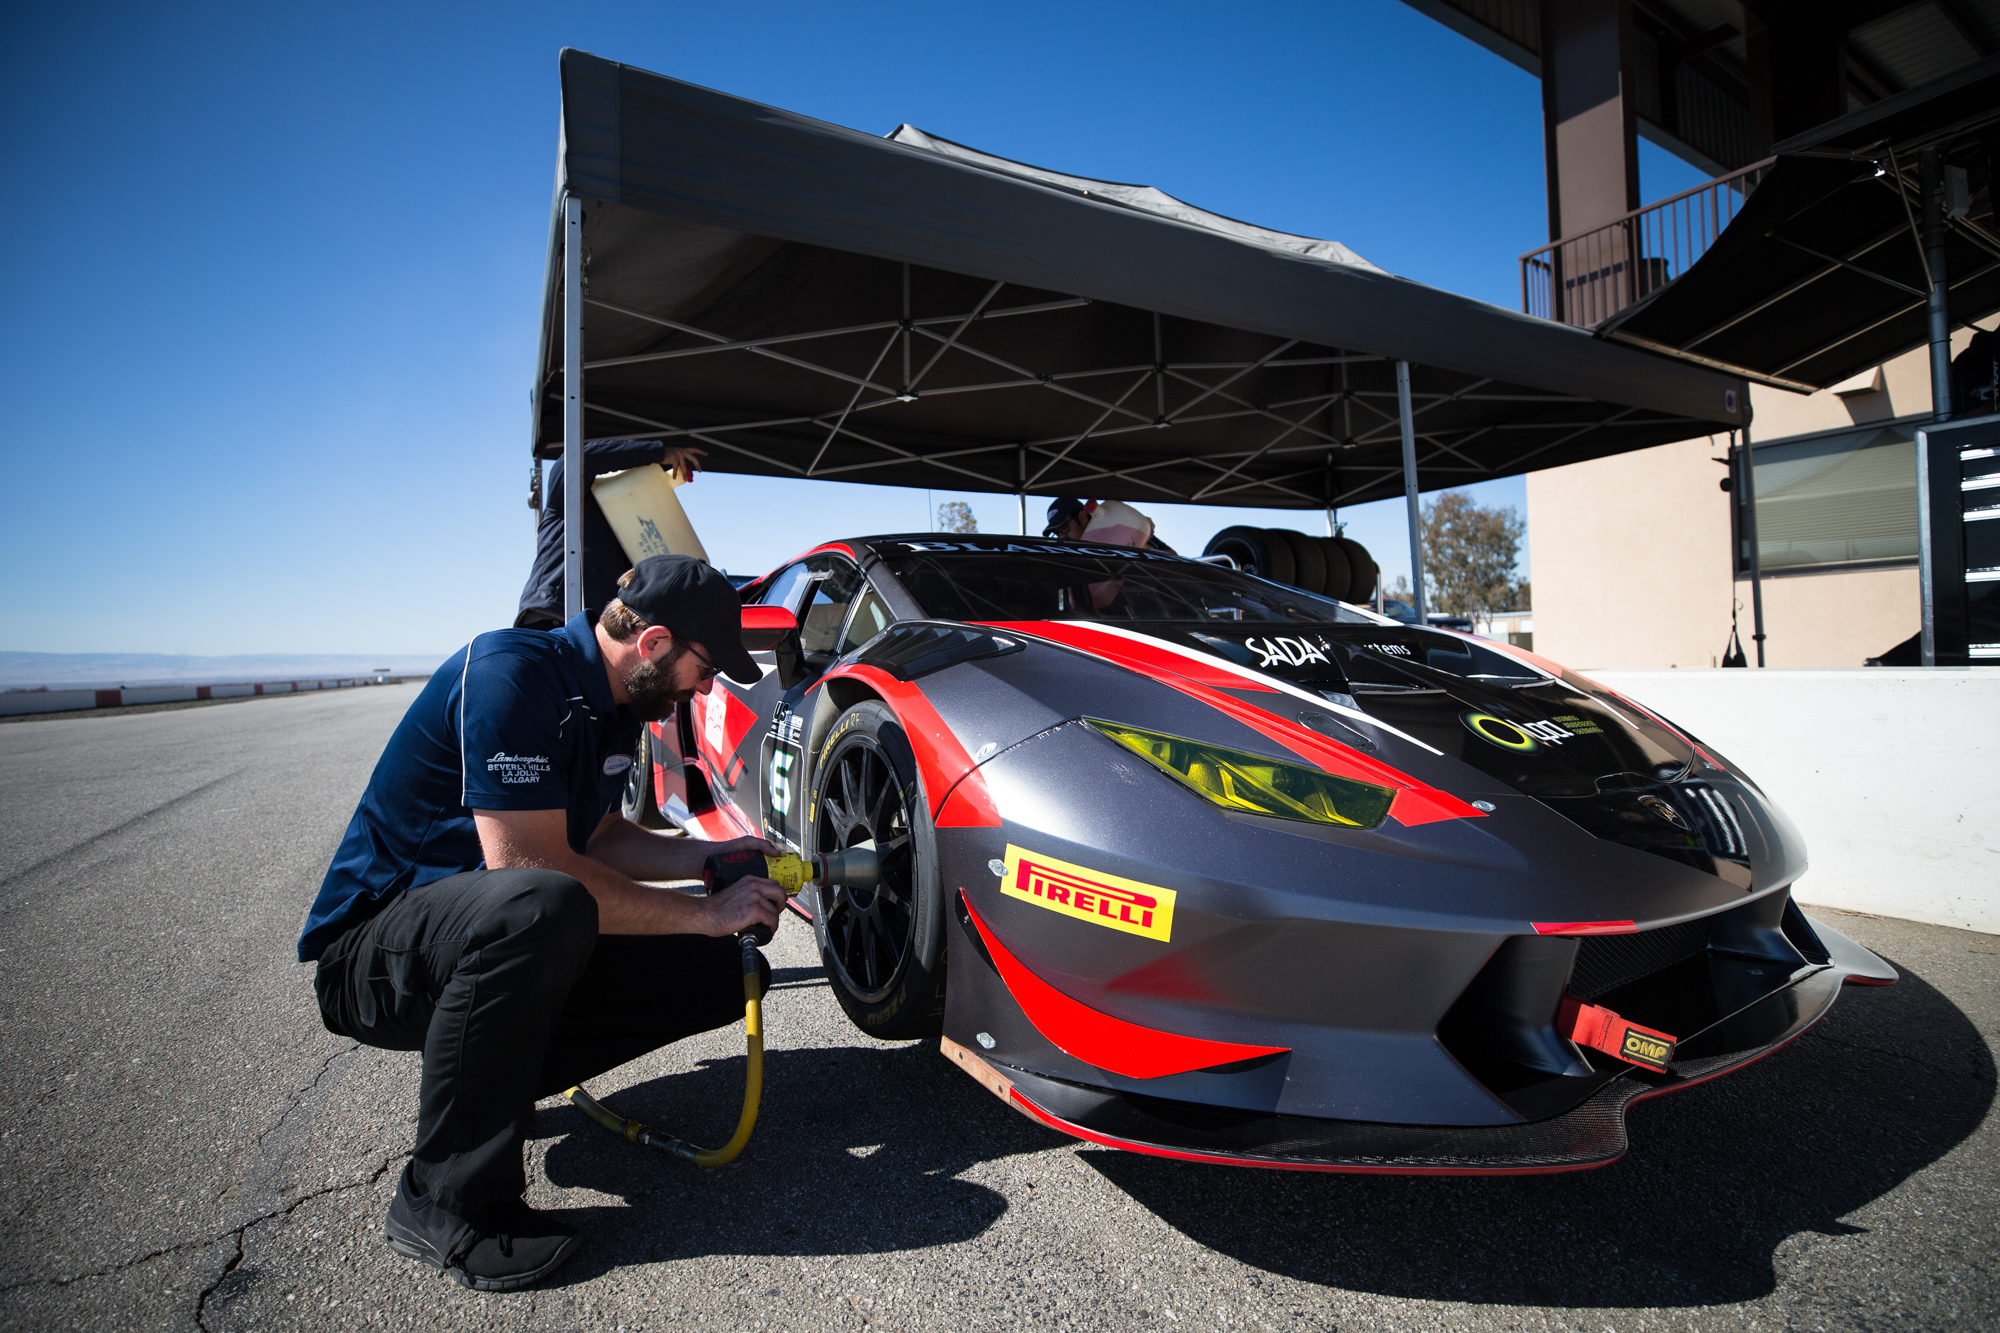 Steven-Racing-20180221-73299.jpg